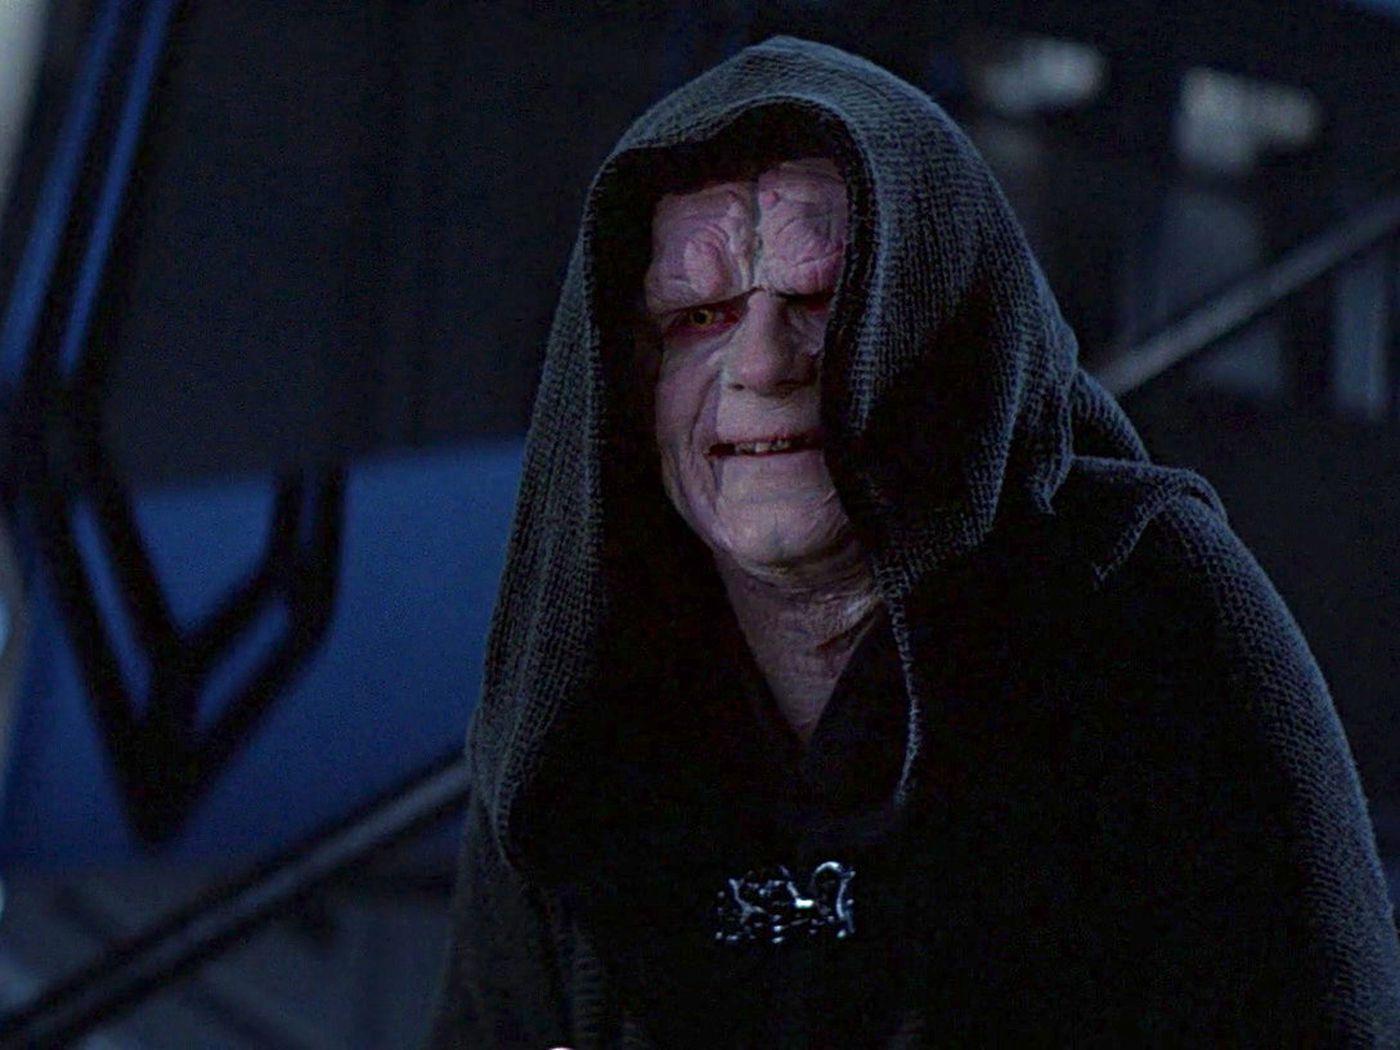 Emperor Palpatine S Return In Star Wars Rise Of Skywalker Explained Polygon